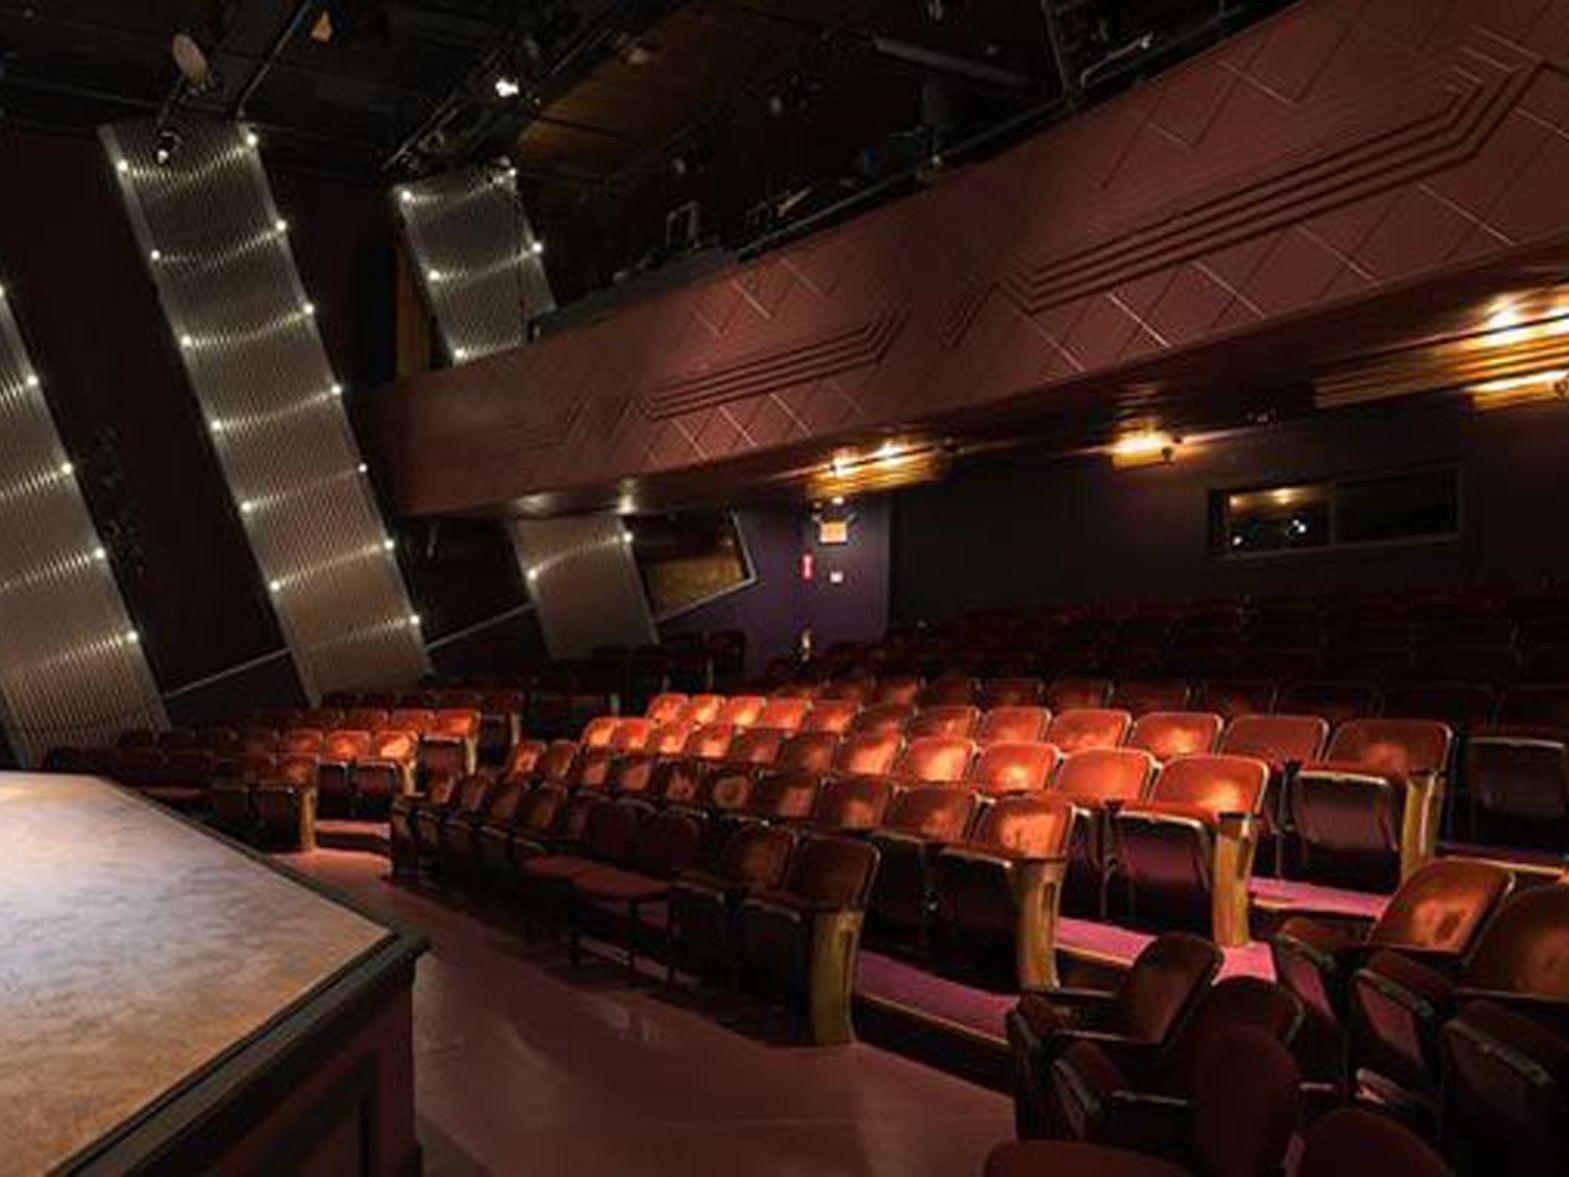 Seats in an auditorium